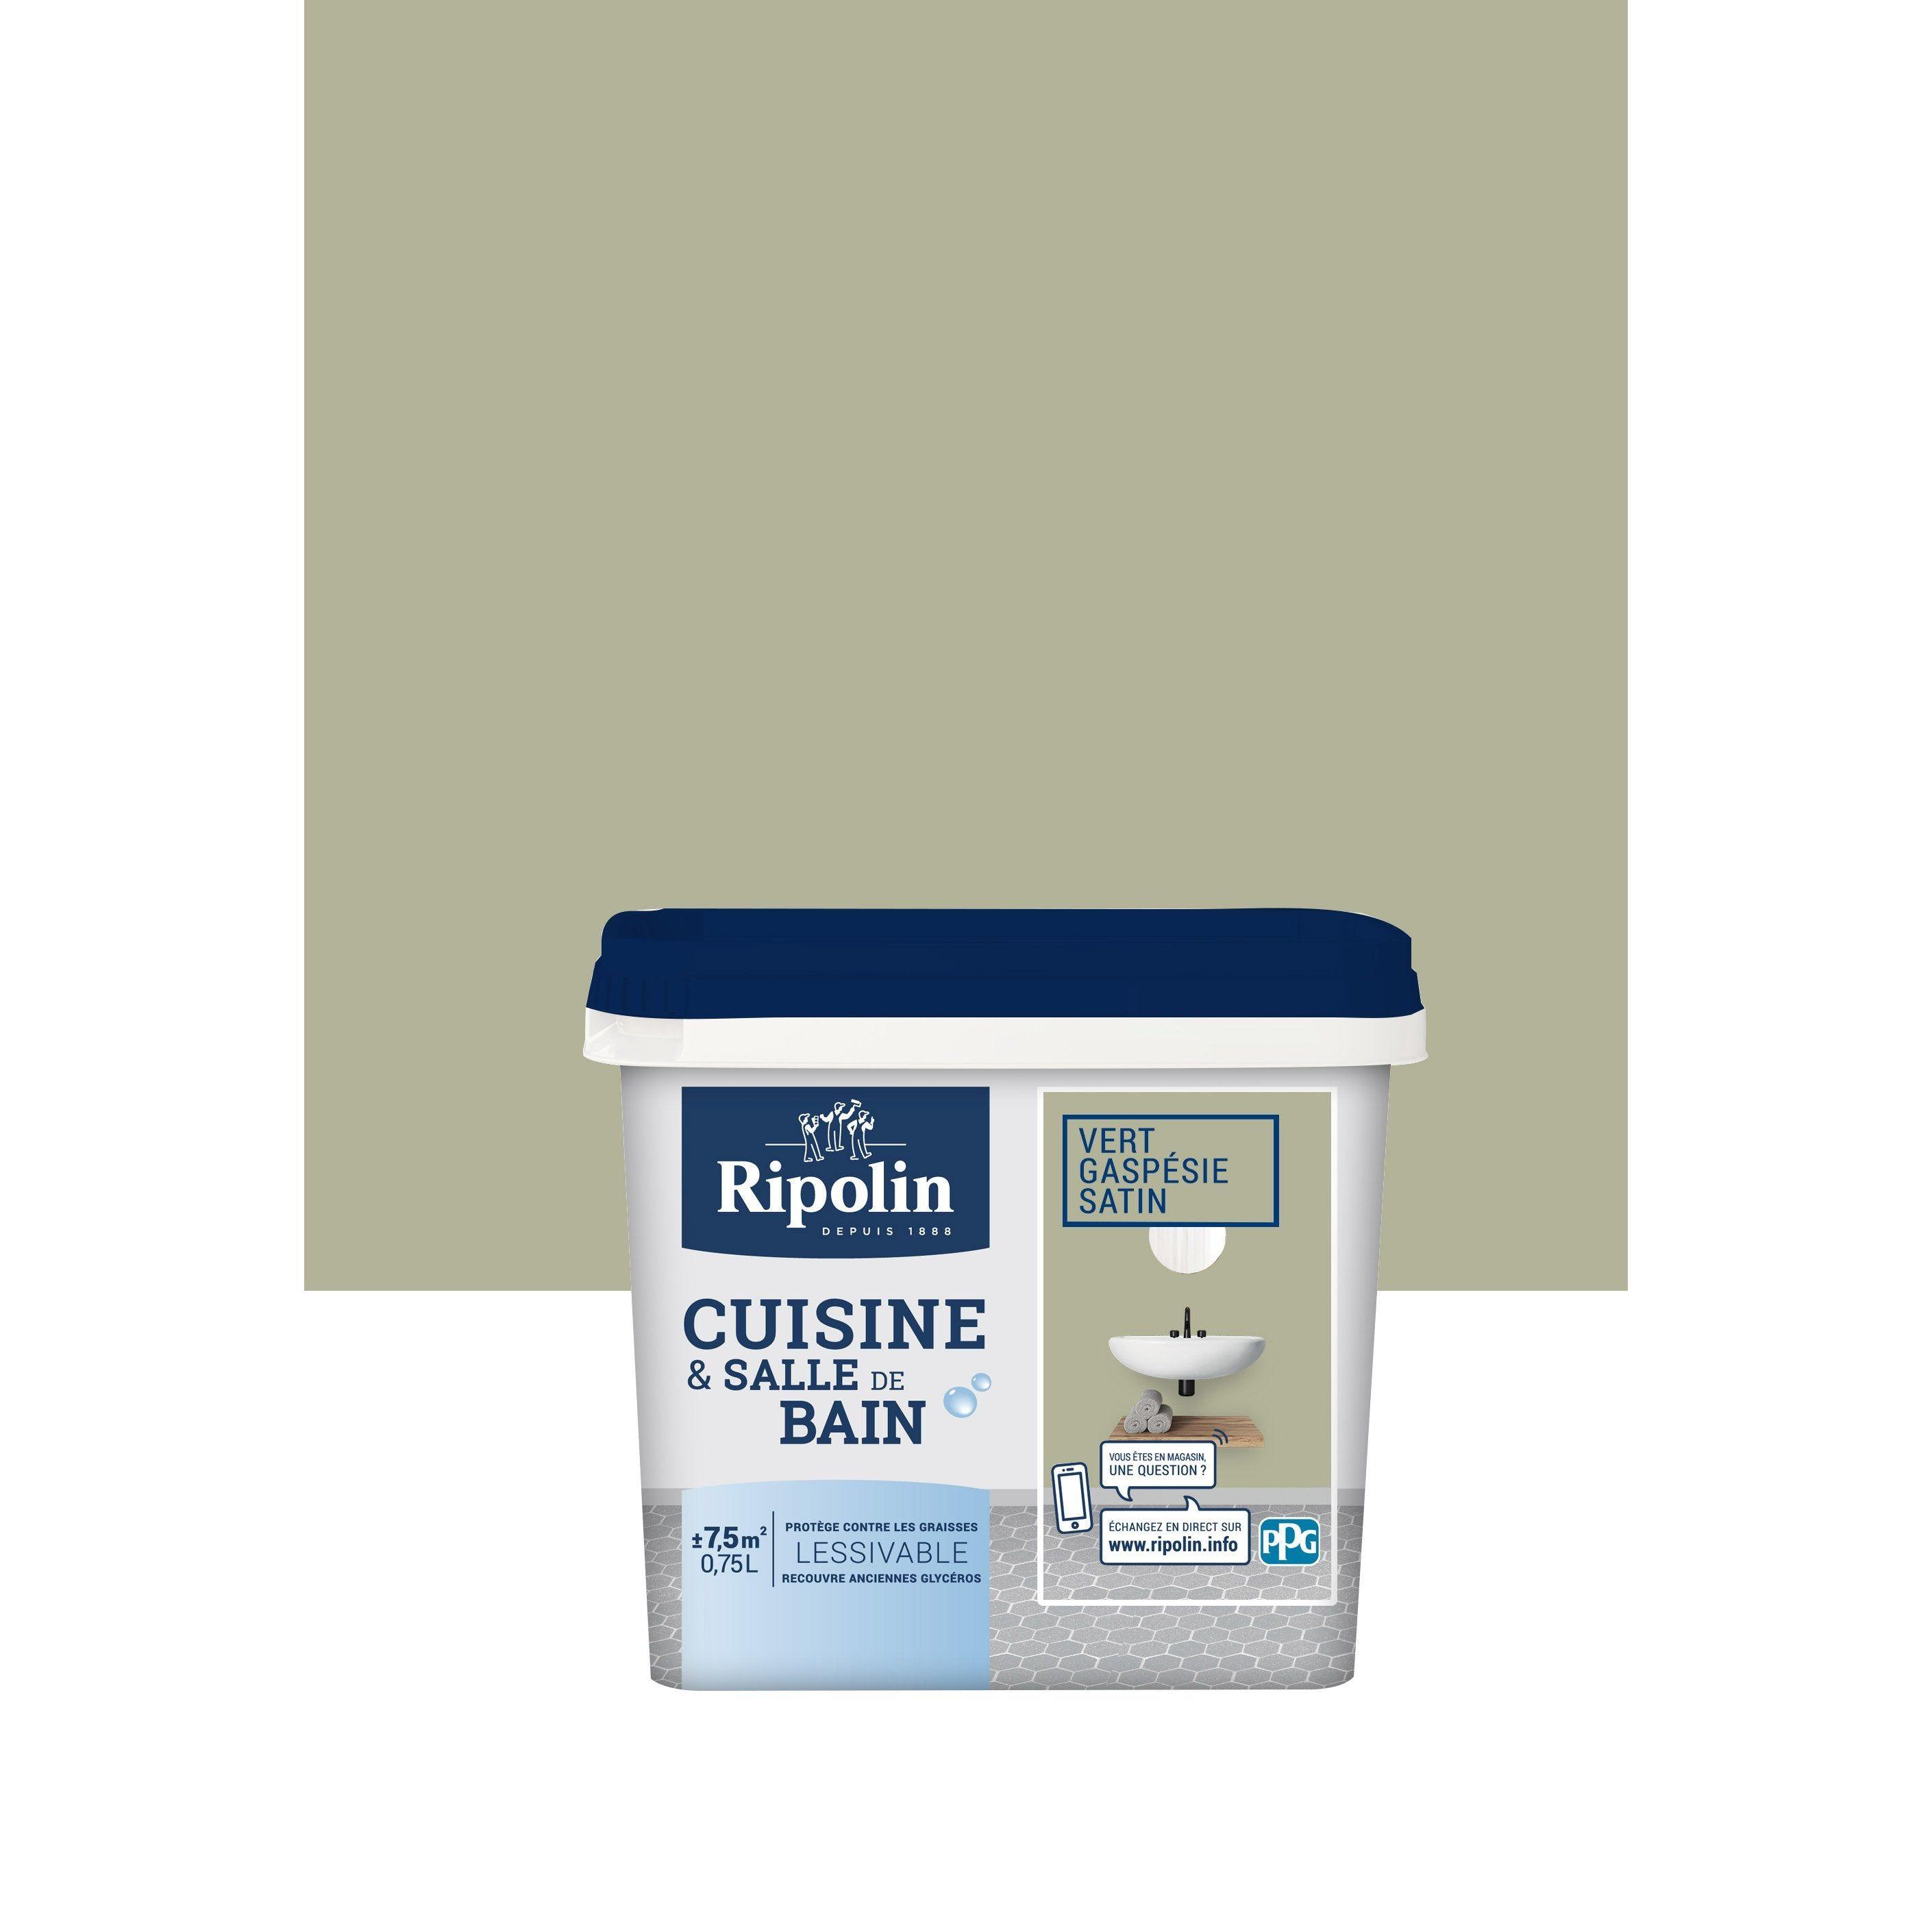 Peinture Mur Cuisine Et Bain Piece Humide Cuisine Et Bain Ripolin Vert Gaspes En 2020 Peinture Mur Cuisine Peinture Mur Et Peinture Cuisine